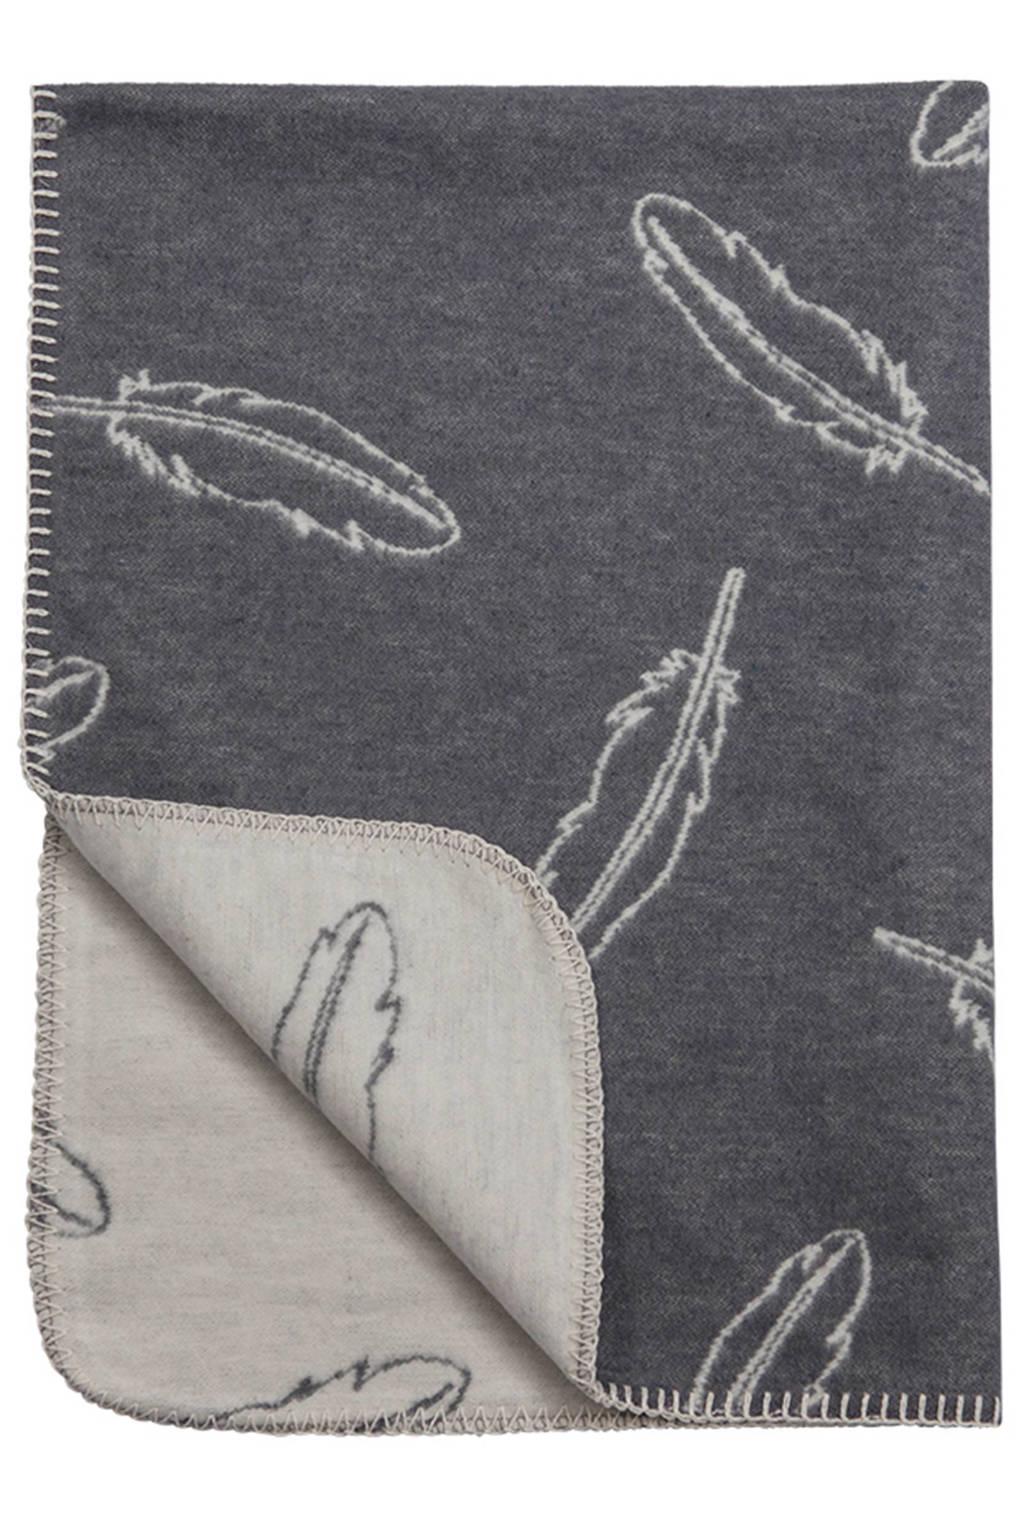 Meyco Feathers ledikantdeken 120x150 cm grijs, Grijs